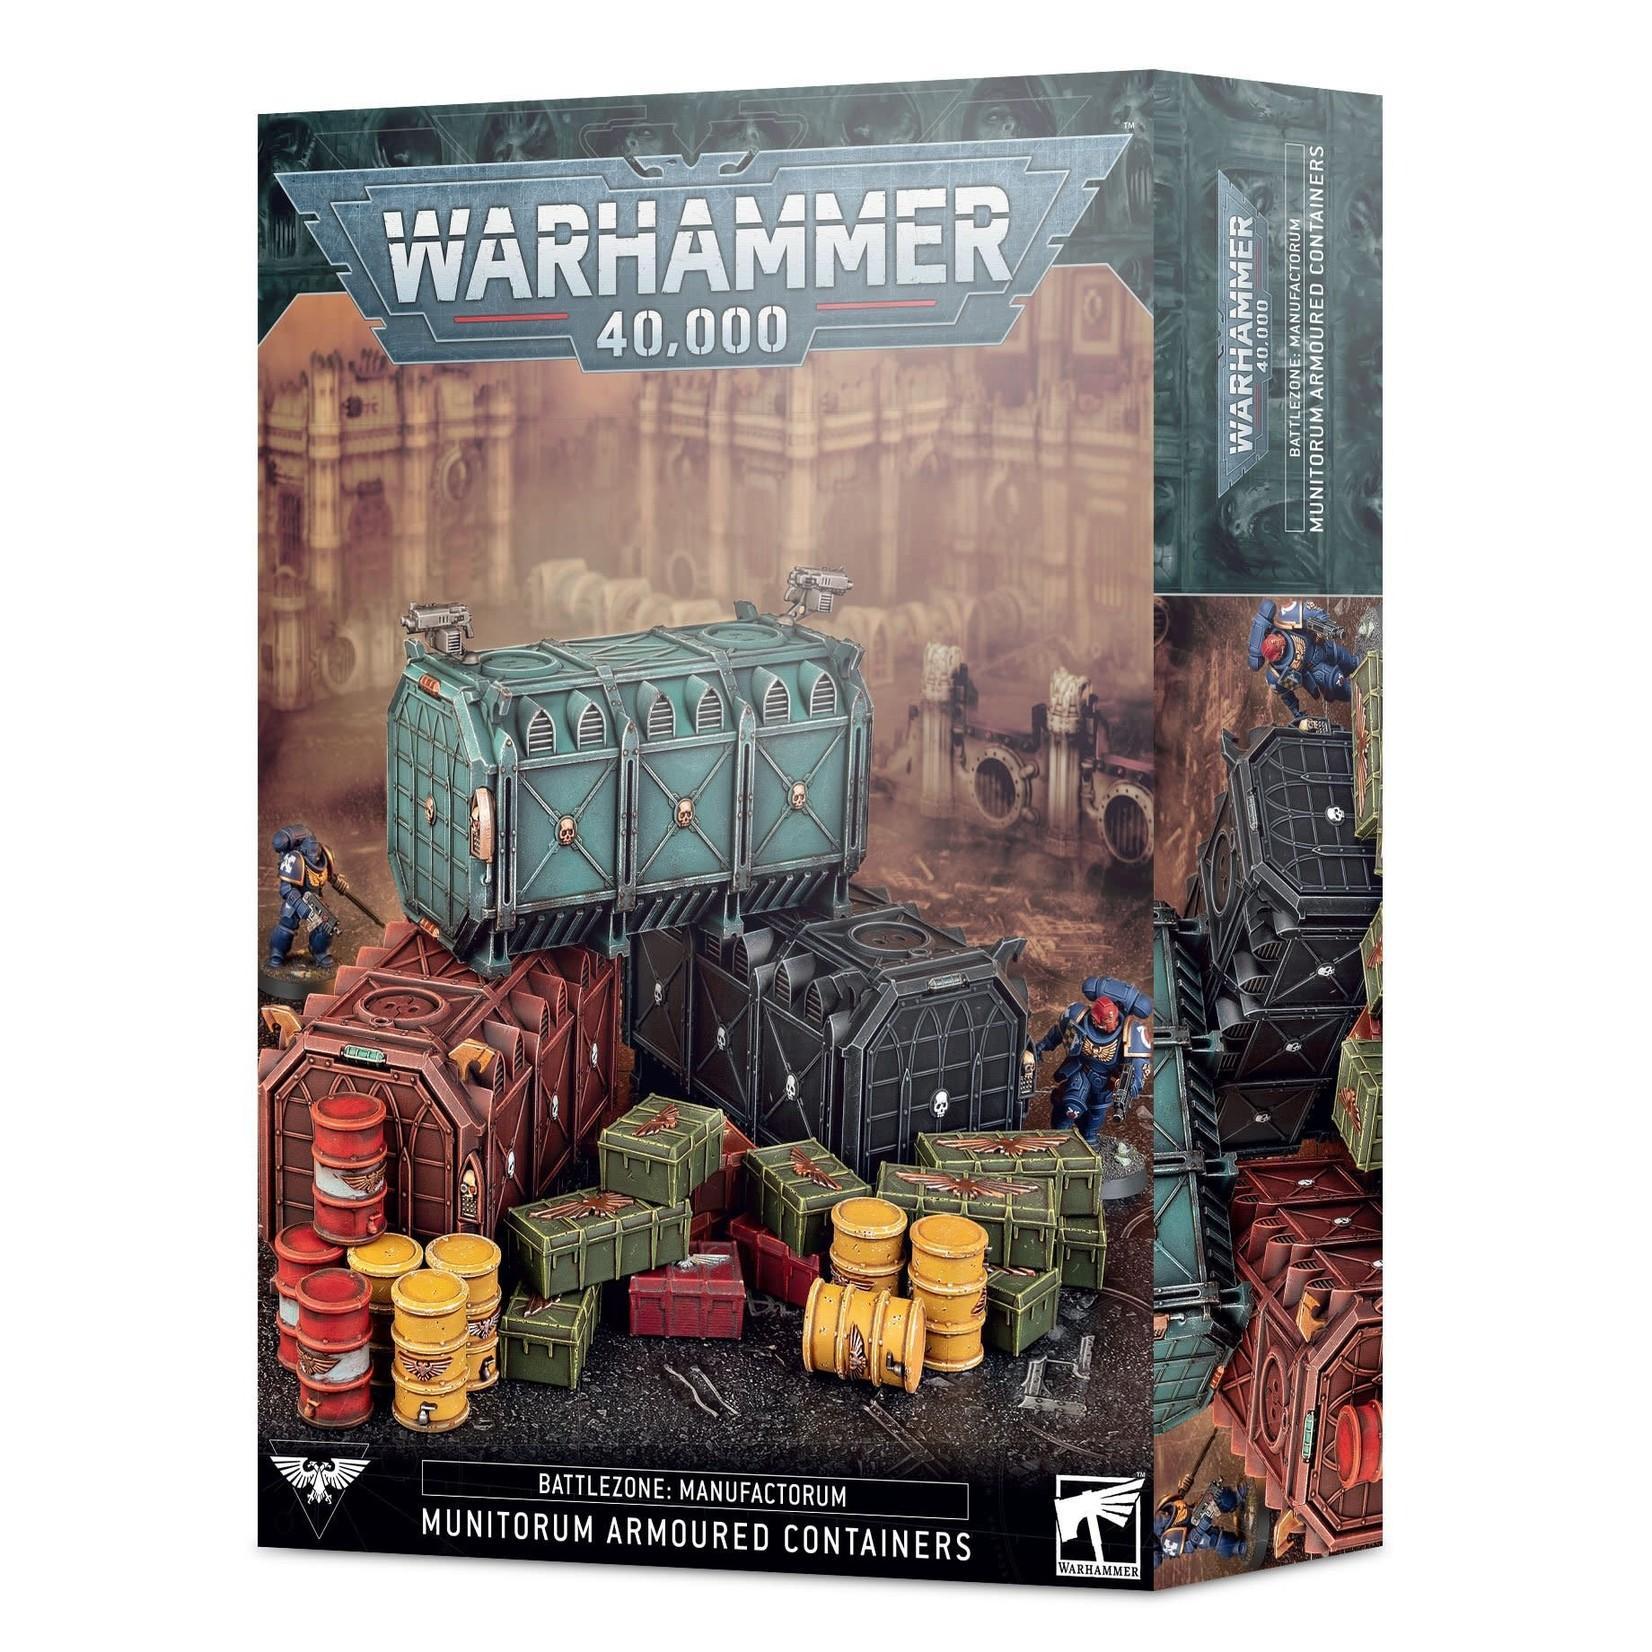 Warhammer 40k BATTLEZONE: MUNITORUM ARMOURED CONTAINERS